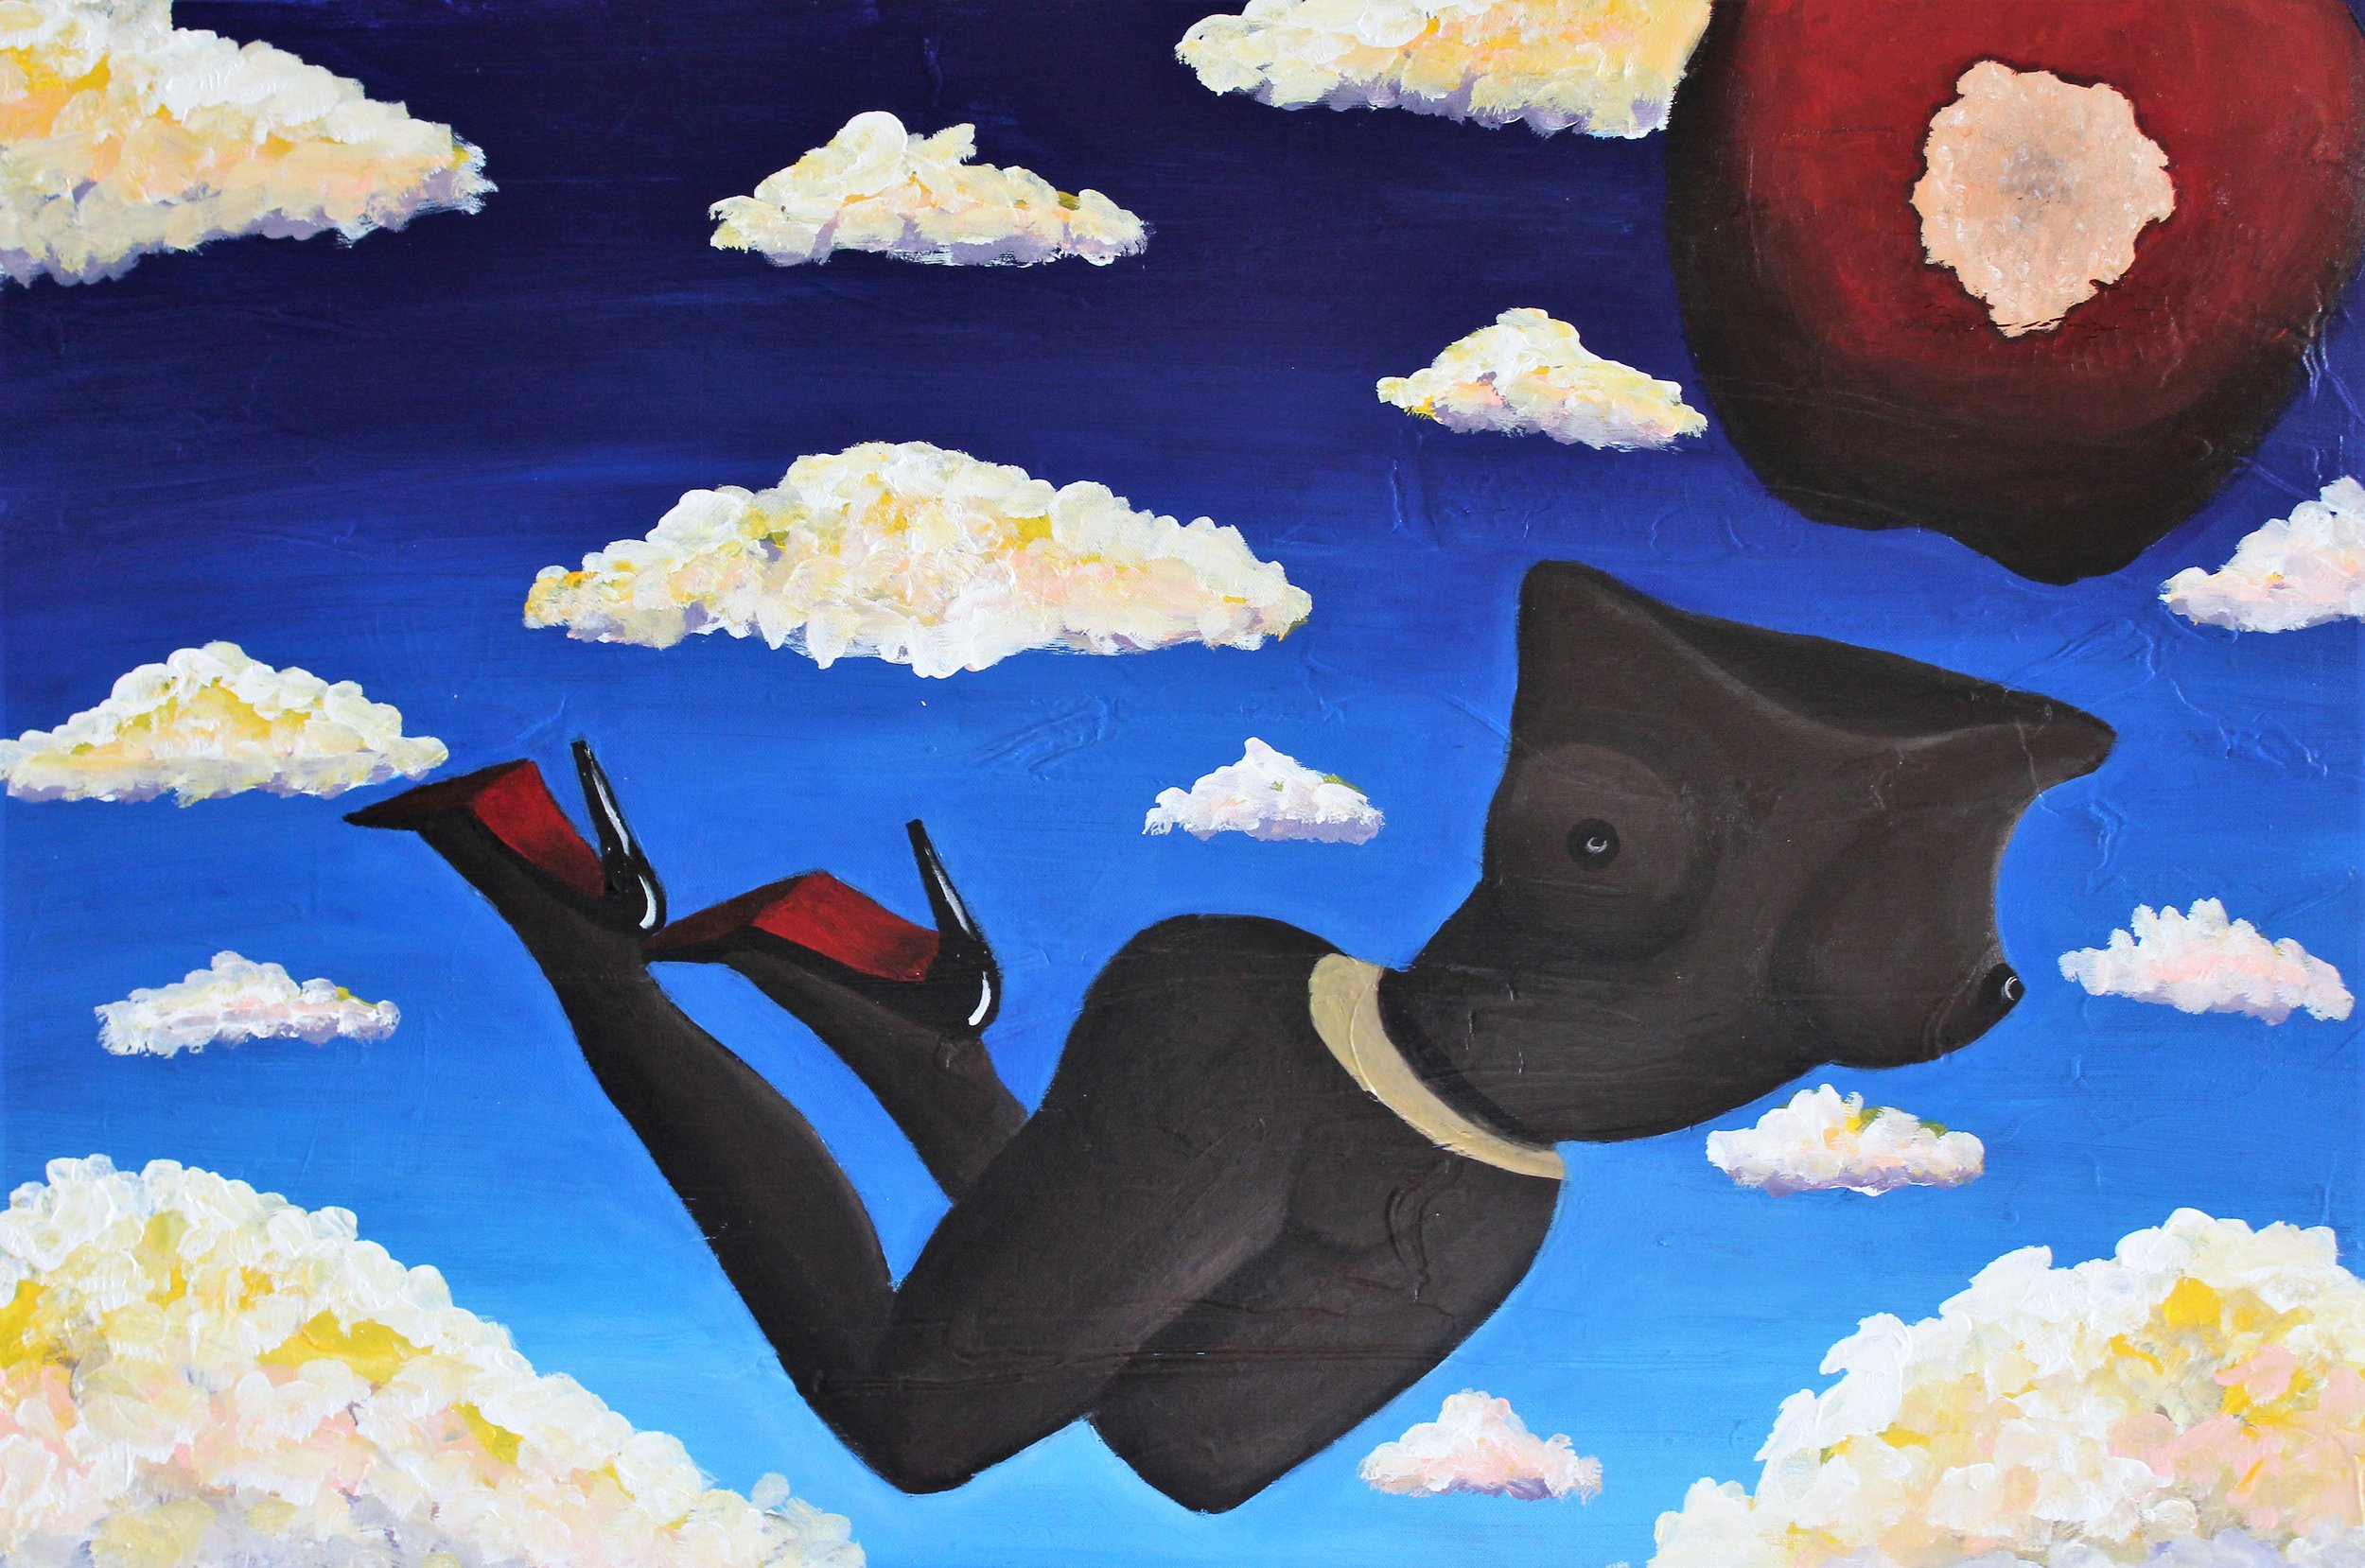 Abi Salami -Untitled - Acrylic on canvas - 24H 36W 1.5D- 2018 - $2250.jpg.jpg